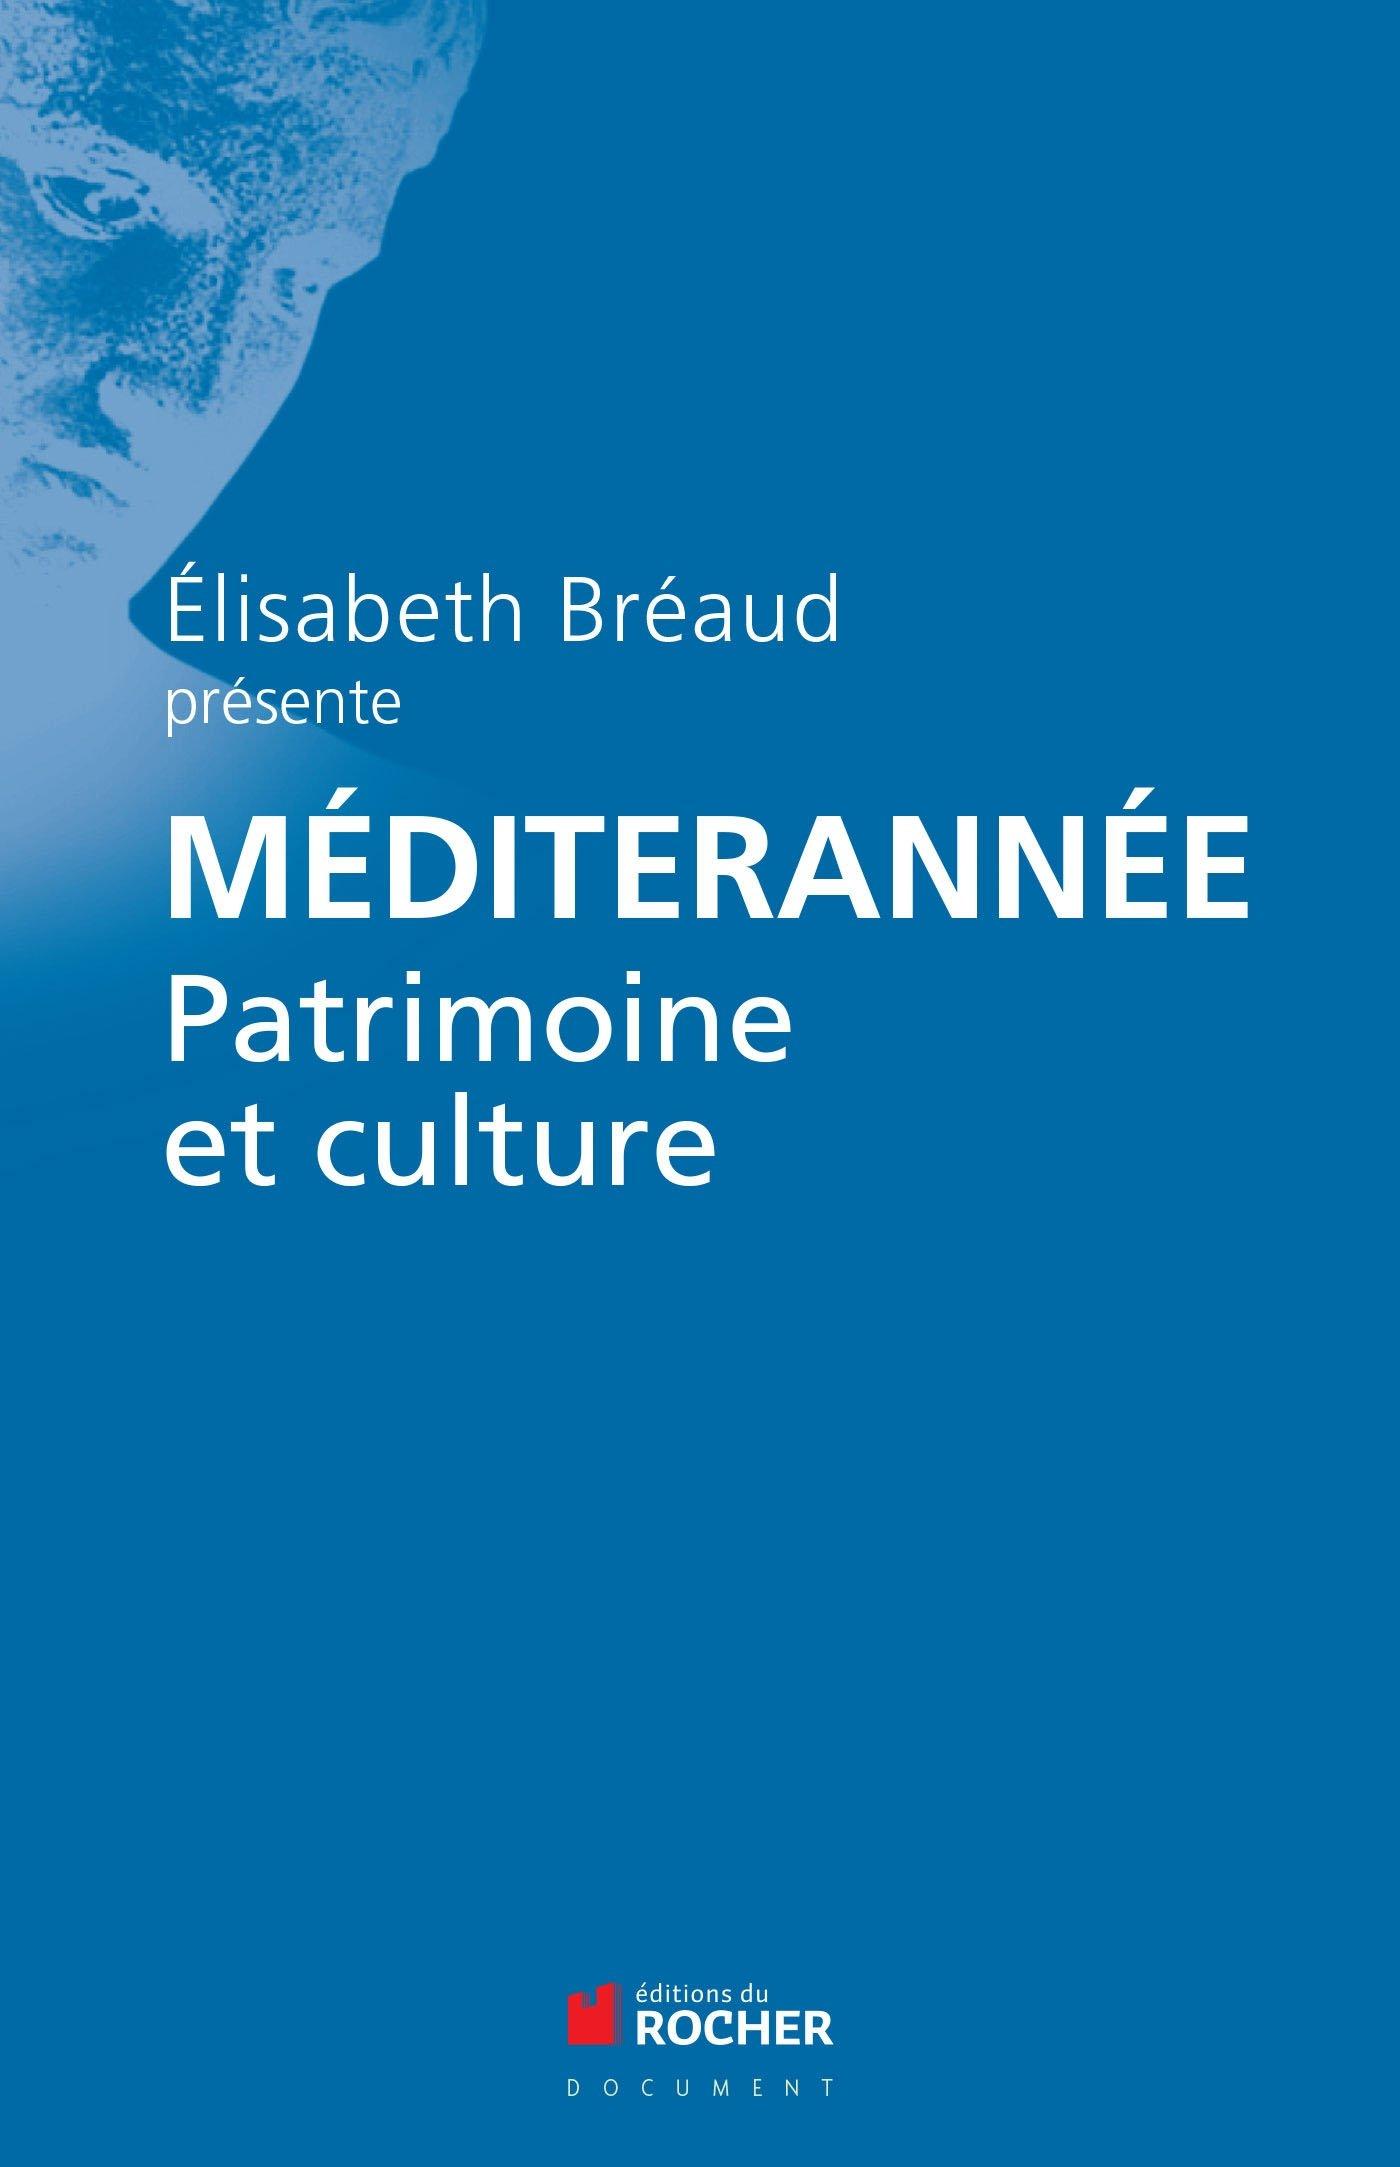 rencontres monaco méditerranée